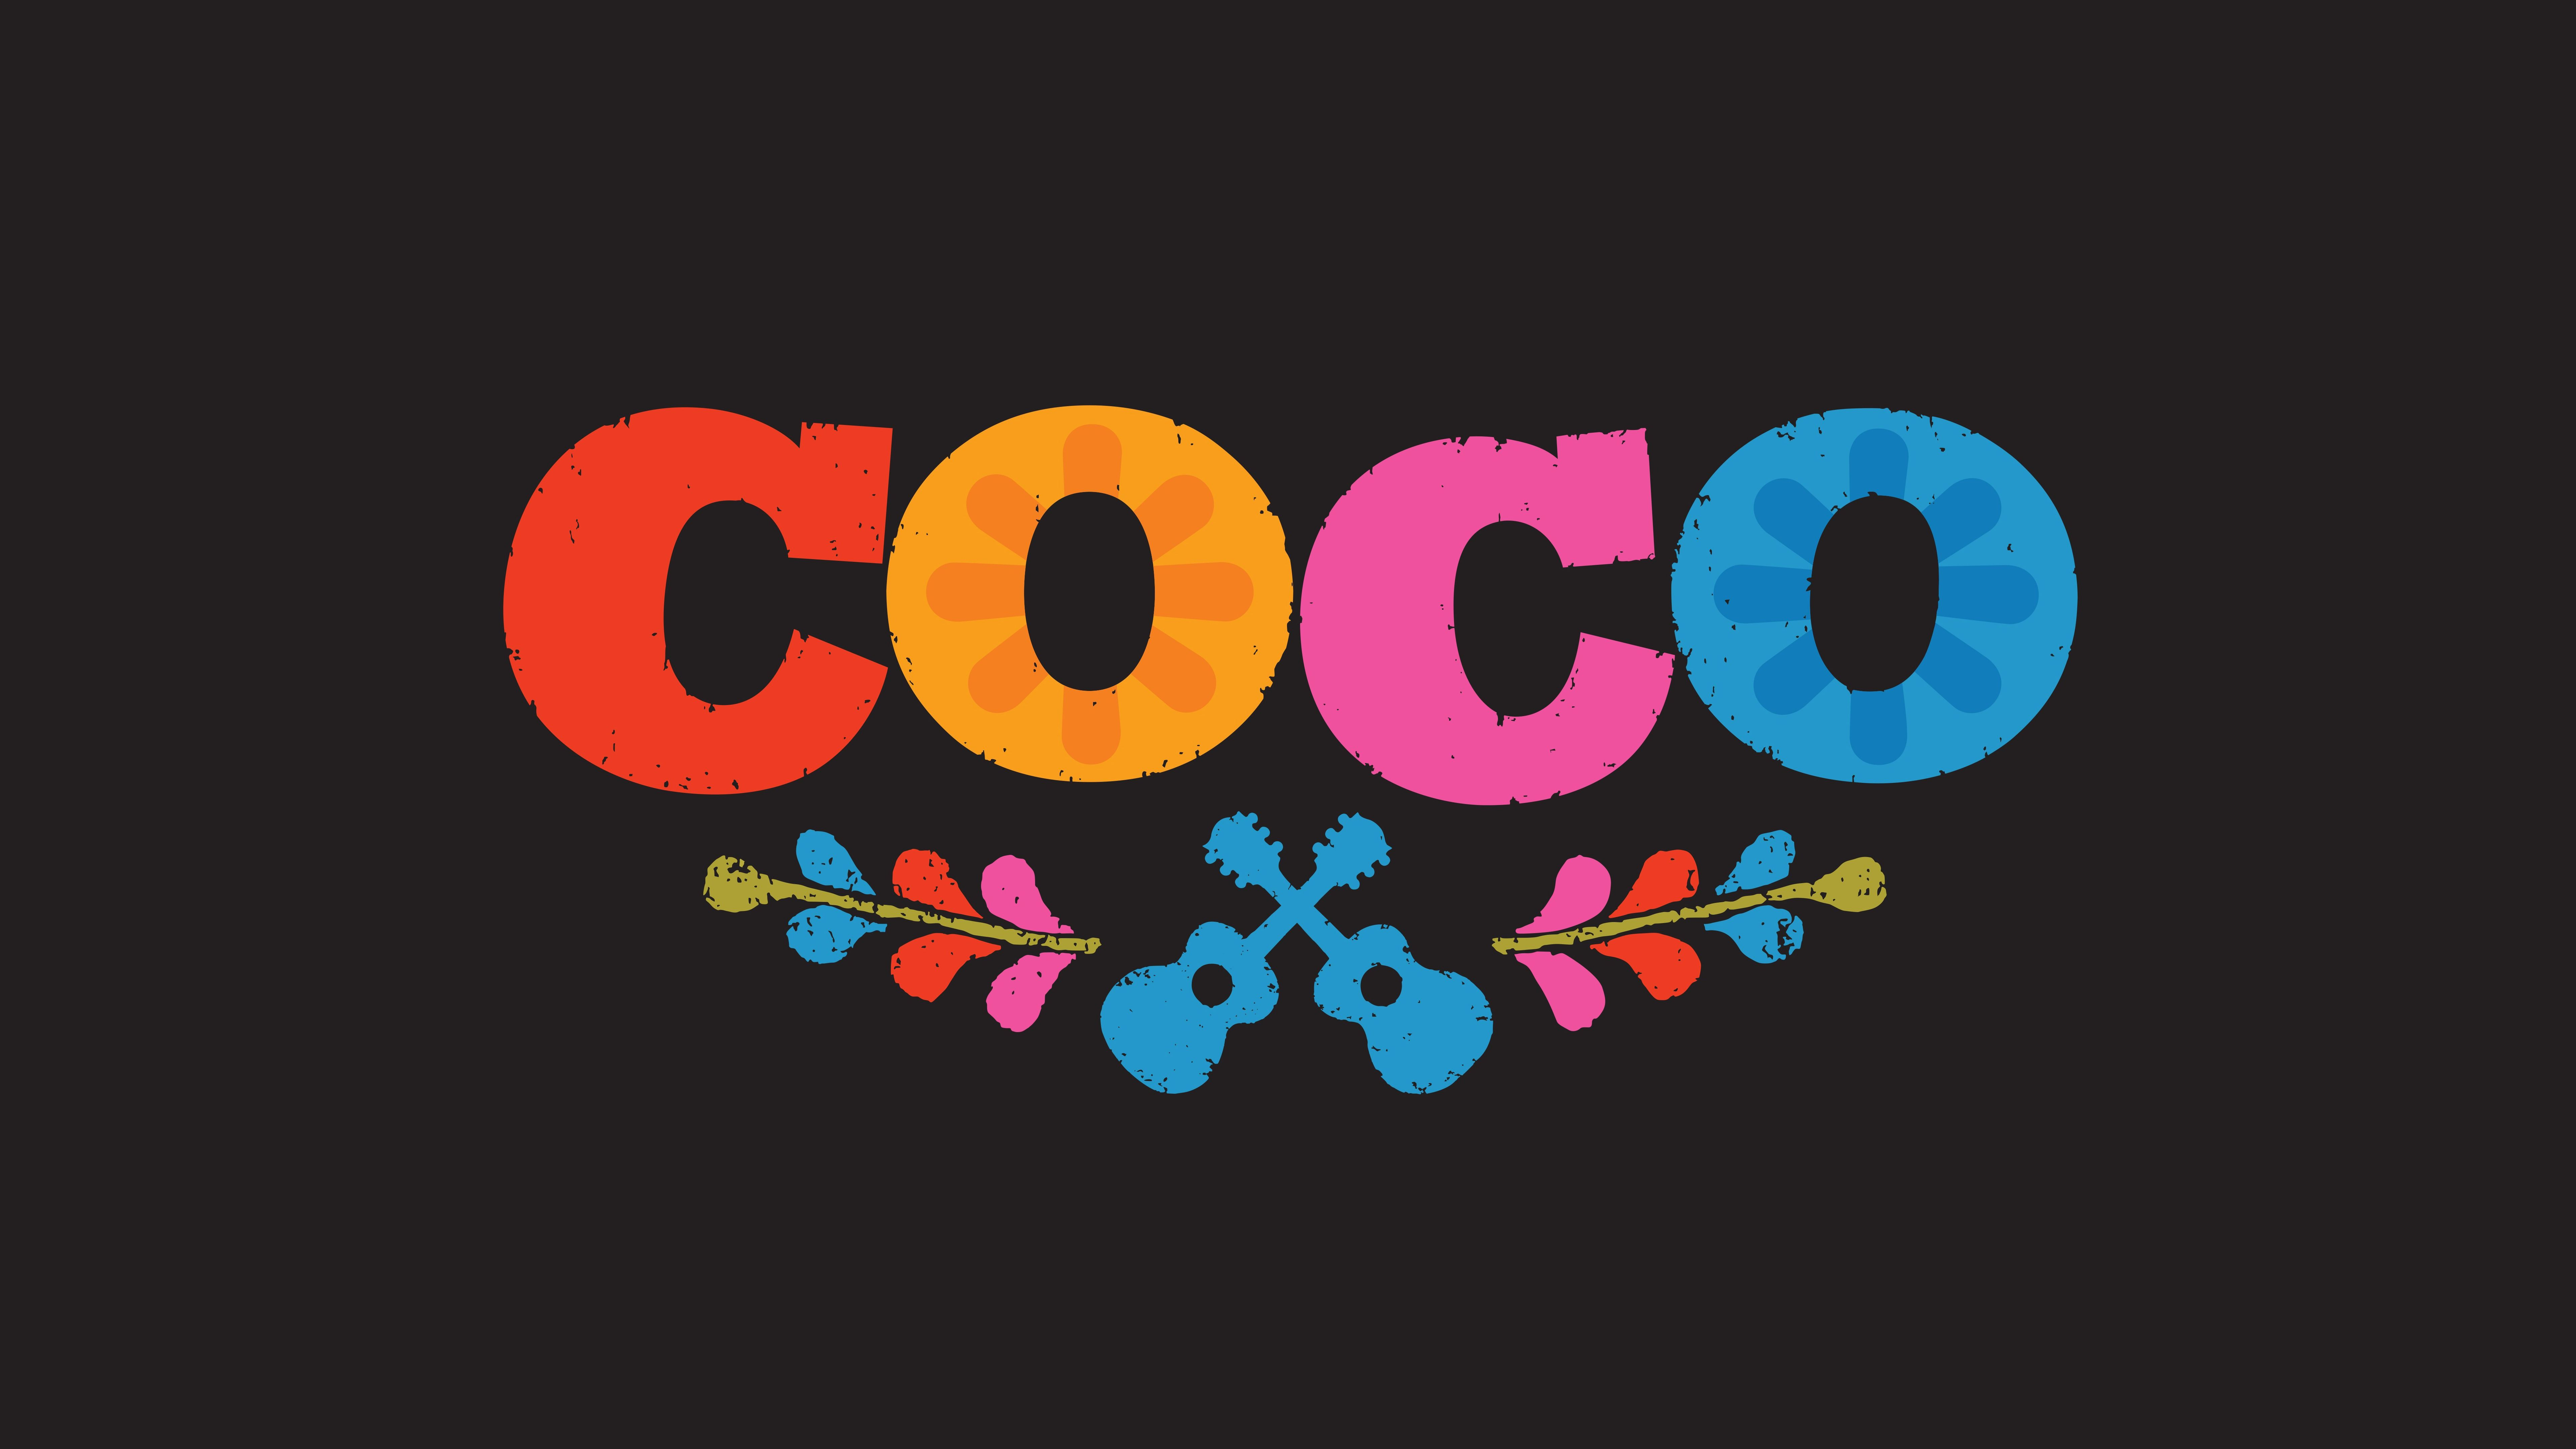 8K Coco 2017 Animated Logo Movie 7680x4320 UHD Wallpaper